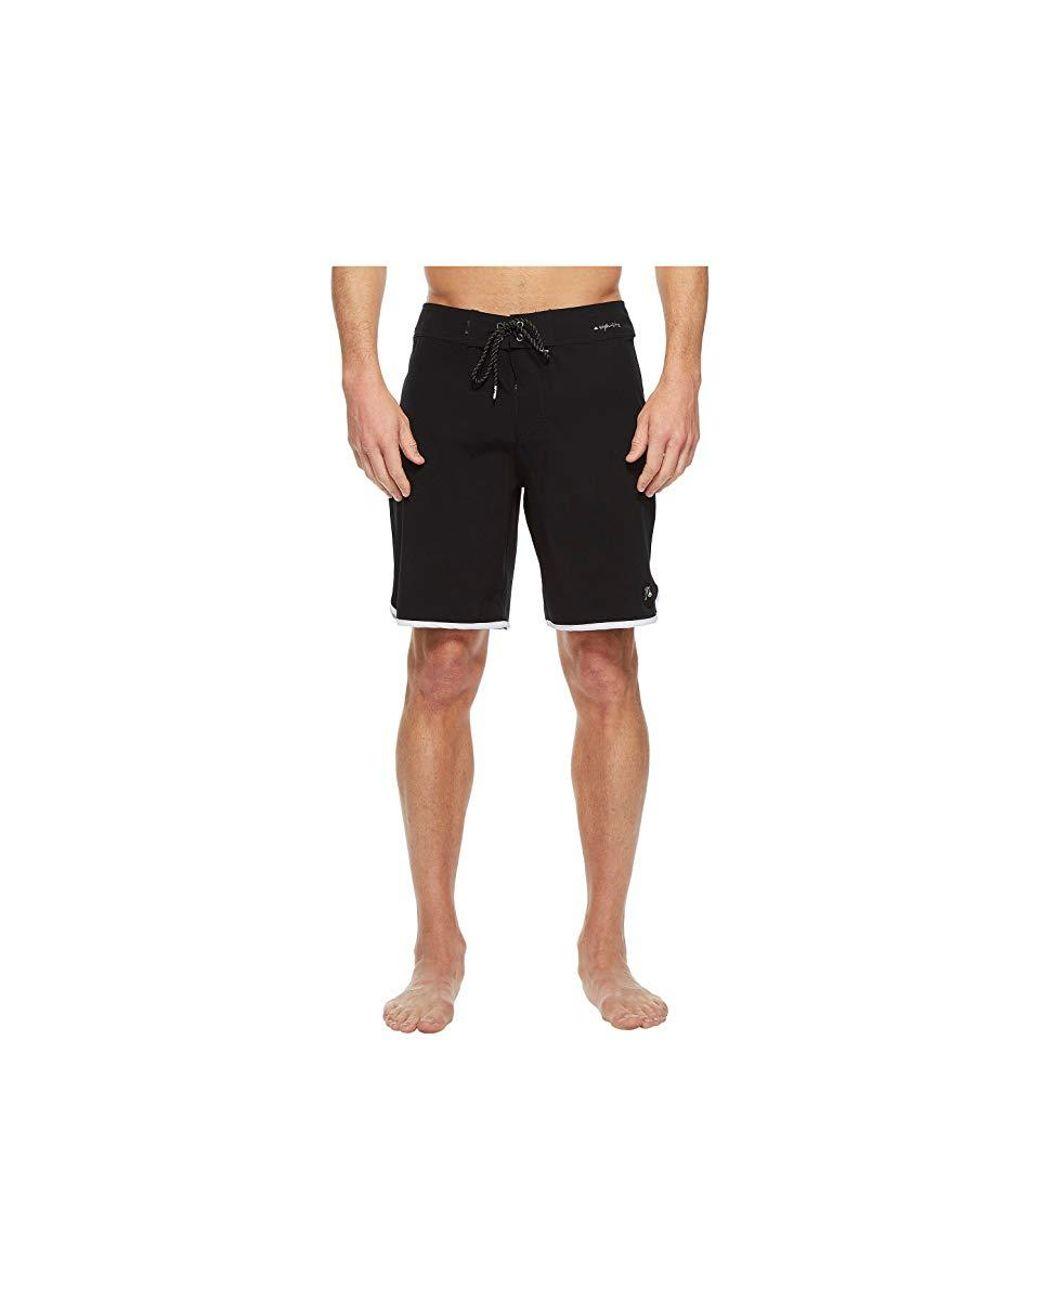 ad2eb32b6c Quiksilver Highline Scallop 19 Boardshorts (black) Swimwear in Black for  Men - Save 31% - Lyst